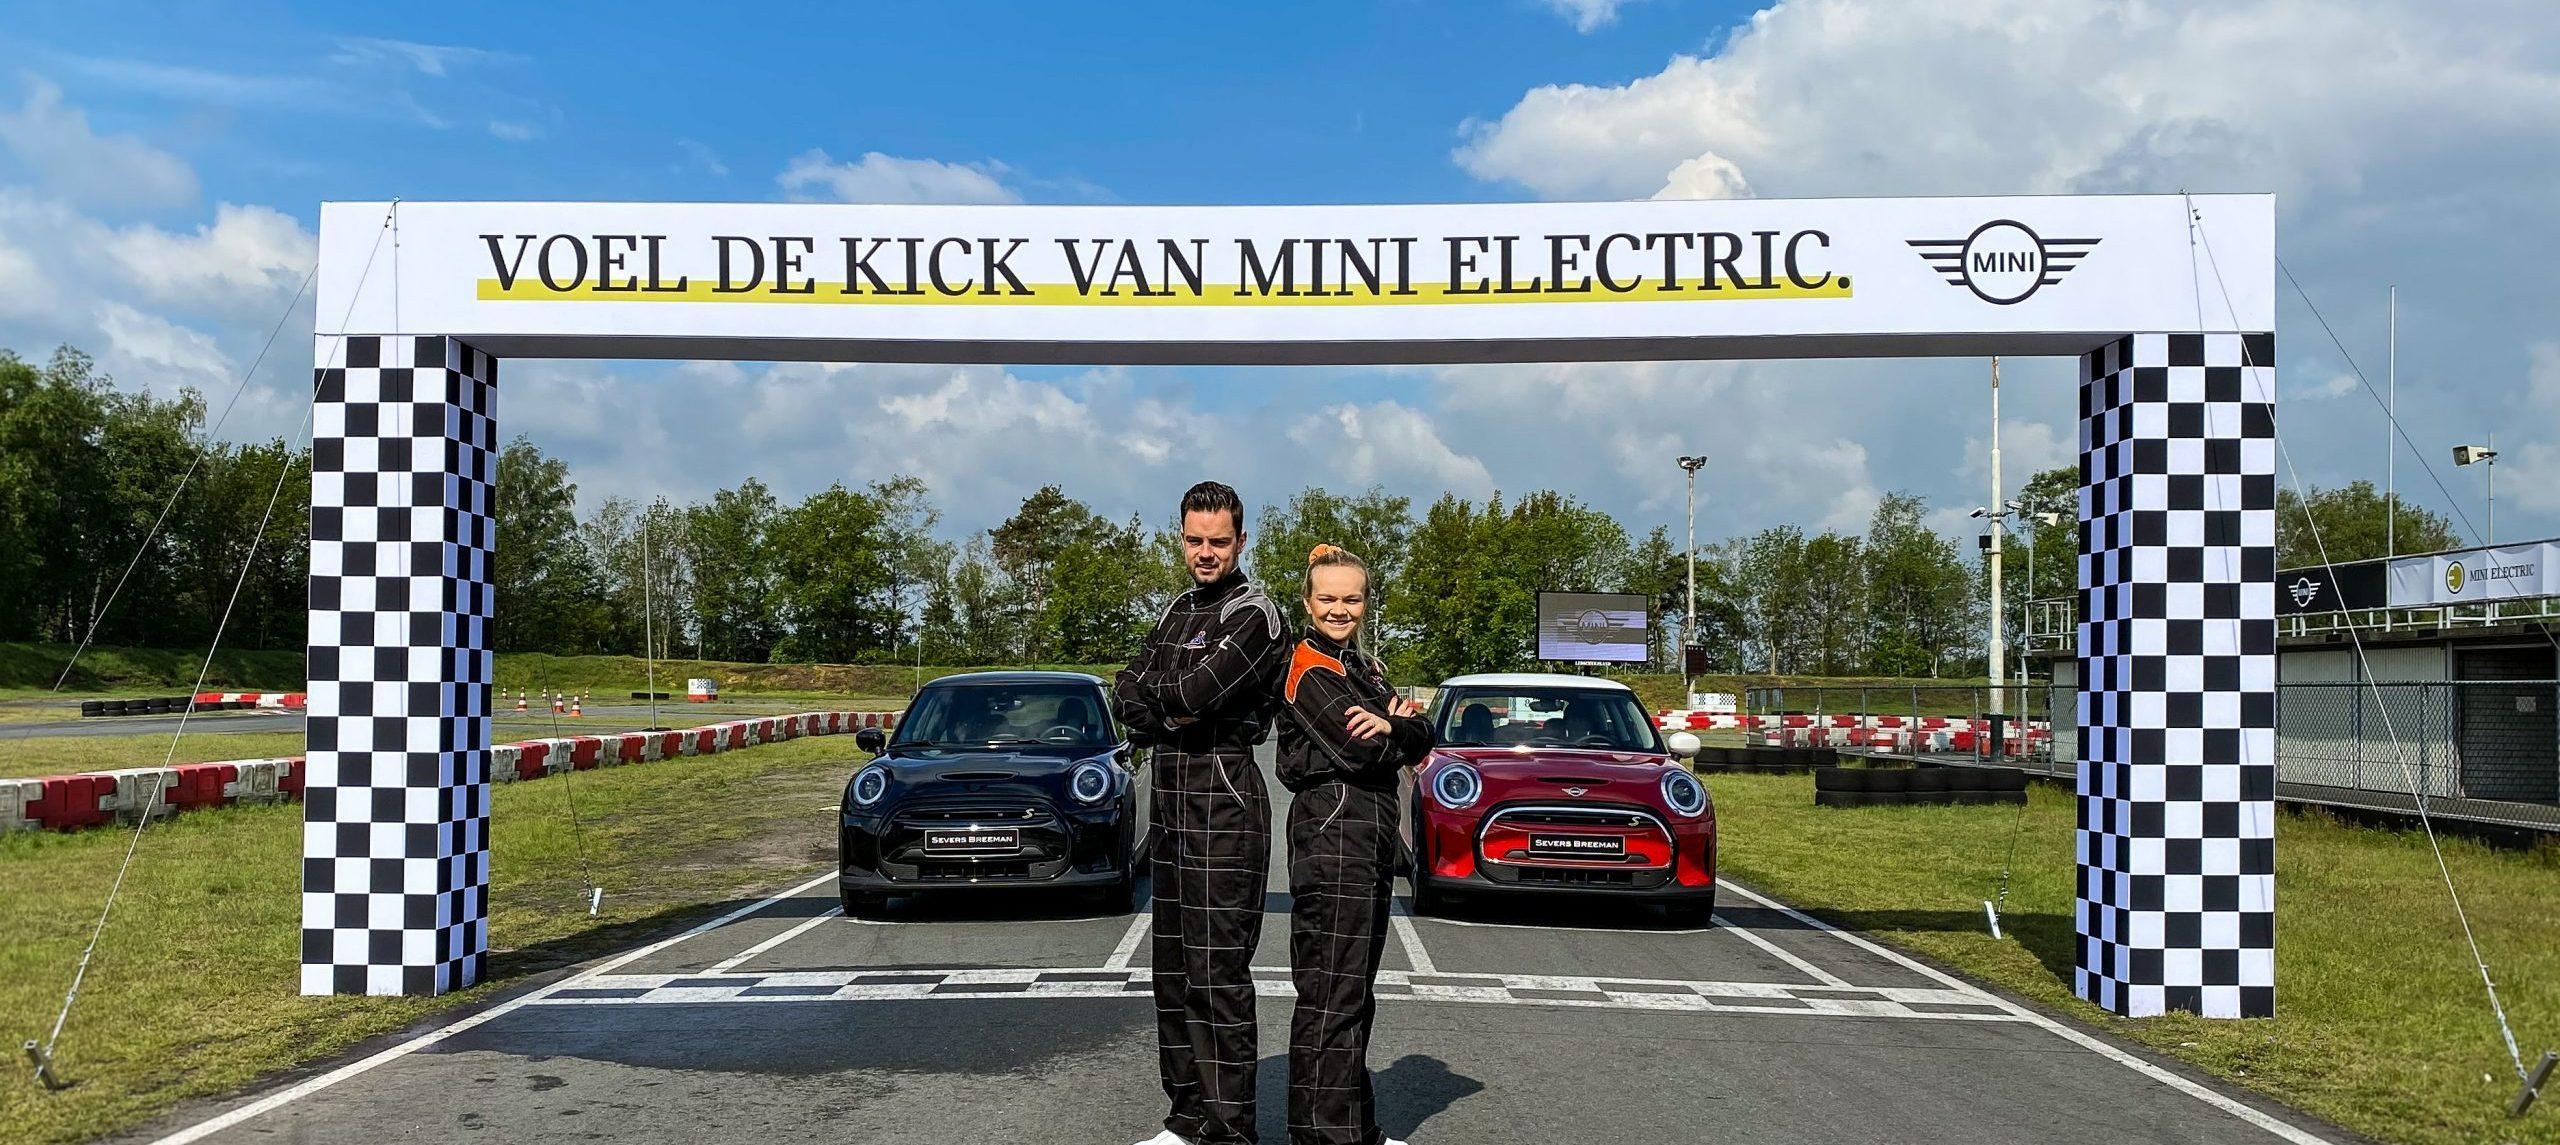 Go-kart feeling van de MINI Electric